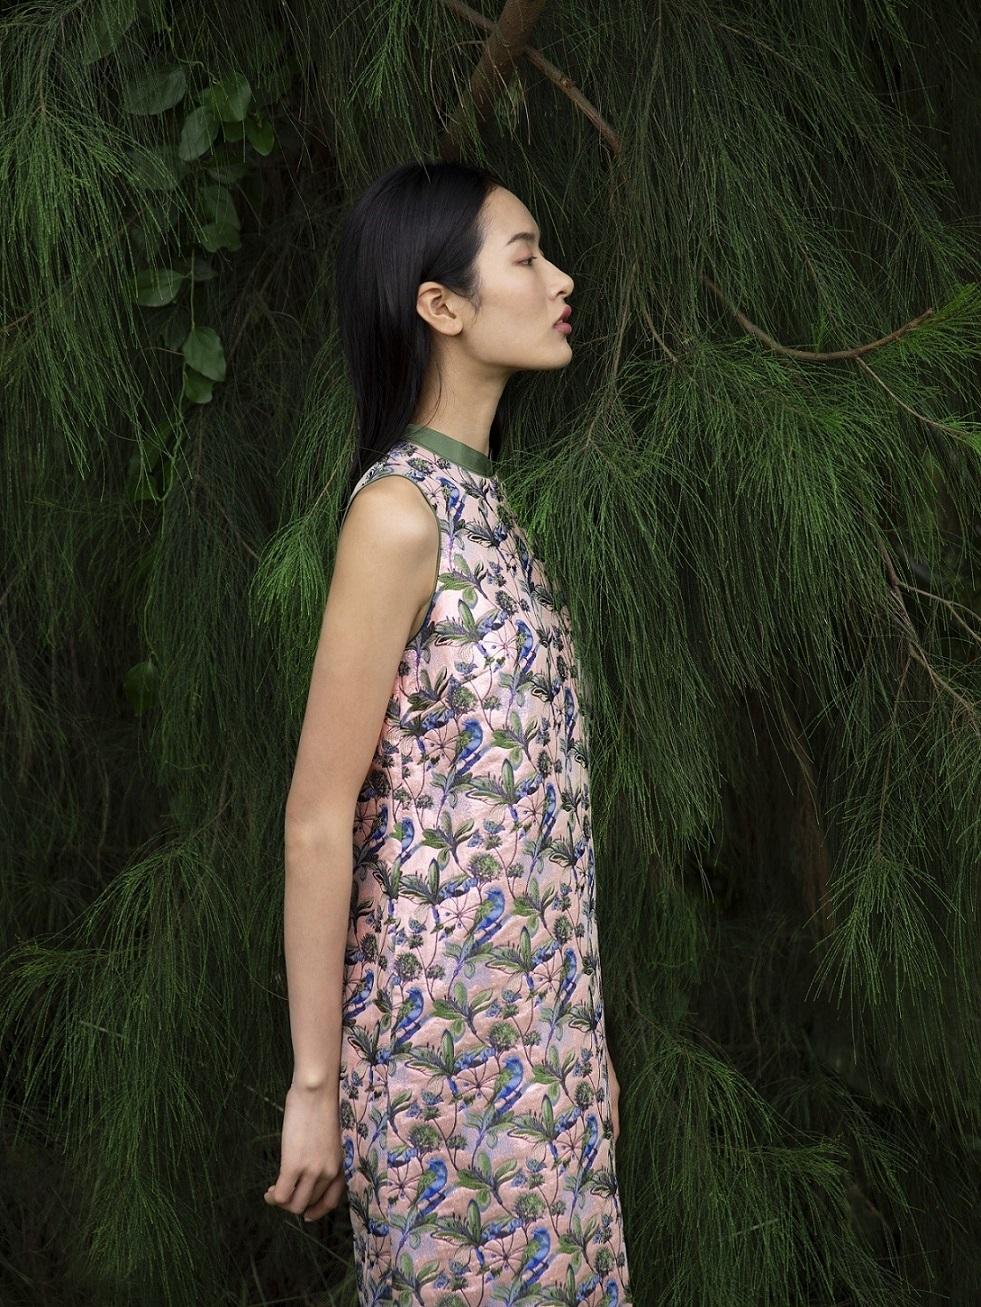 Bird and Floral Jacquard Sleeveless A-line Dress